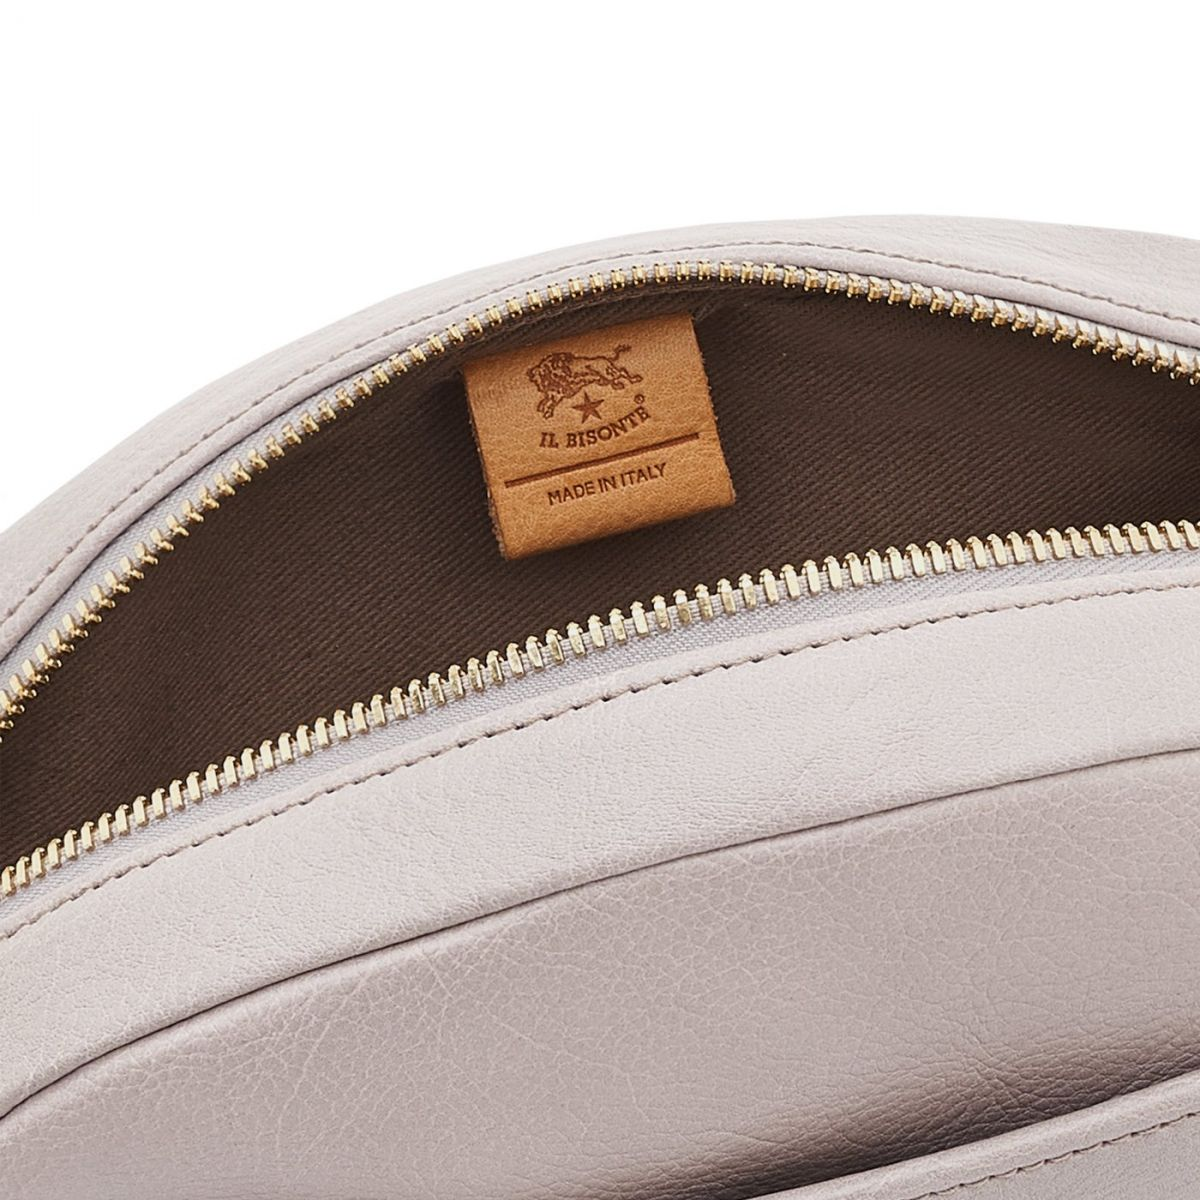 Women's Crossbody Bag in Cowhide Leather color Mauve - BCR243 | Details